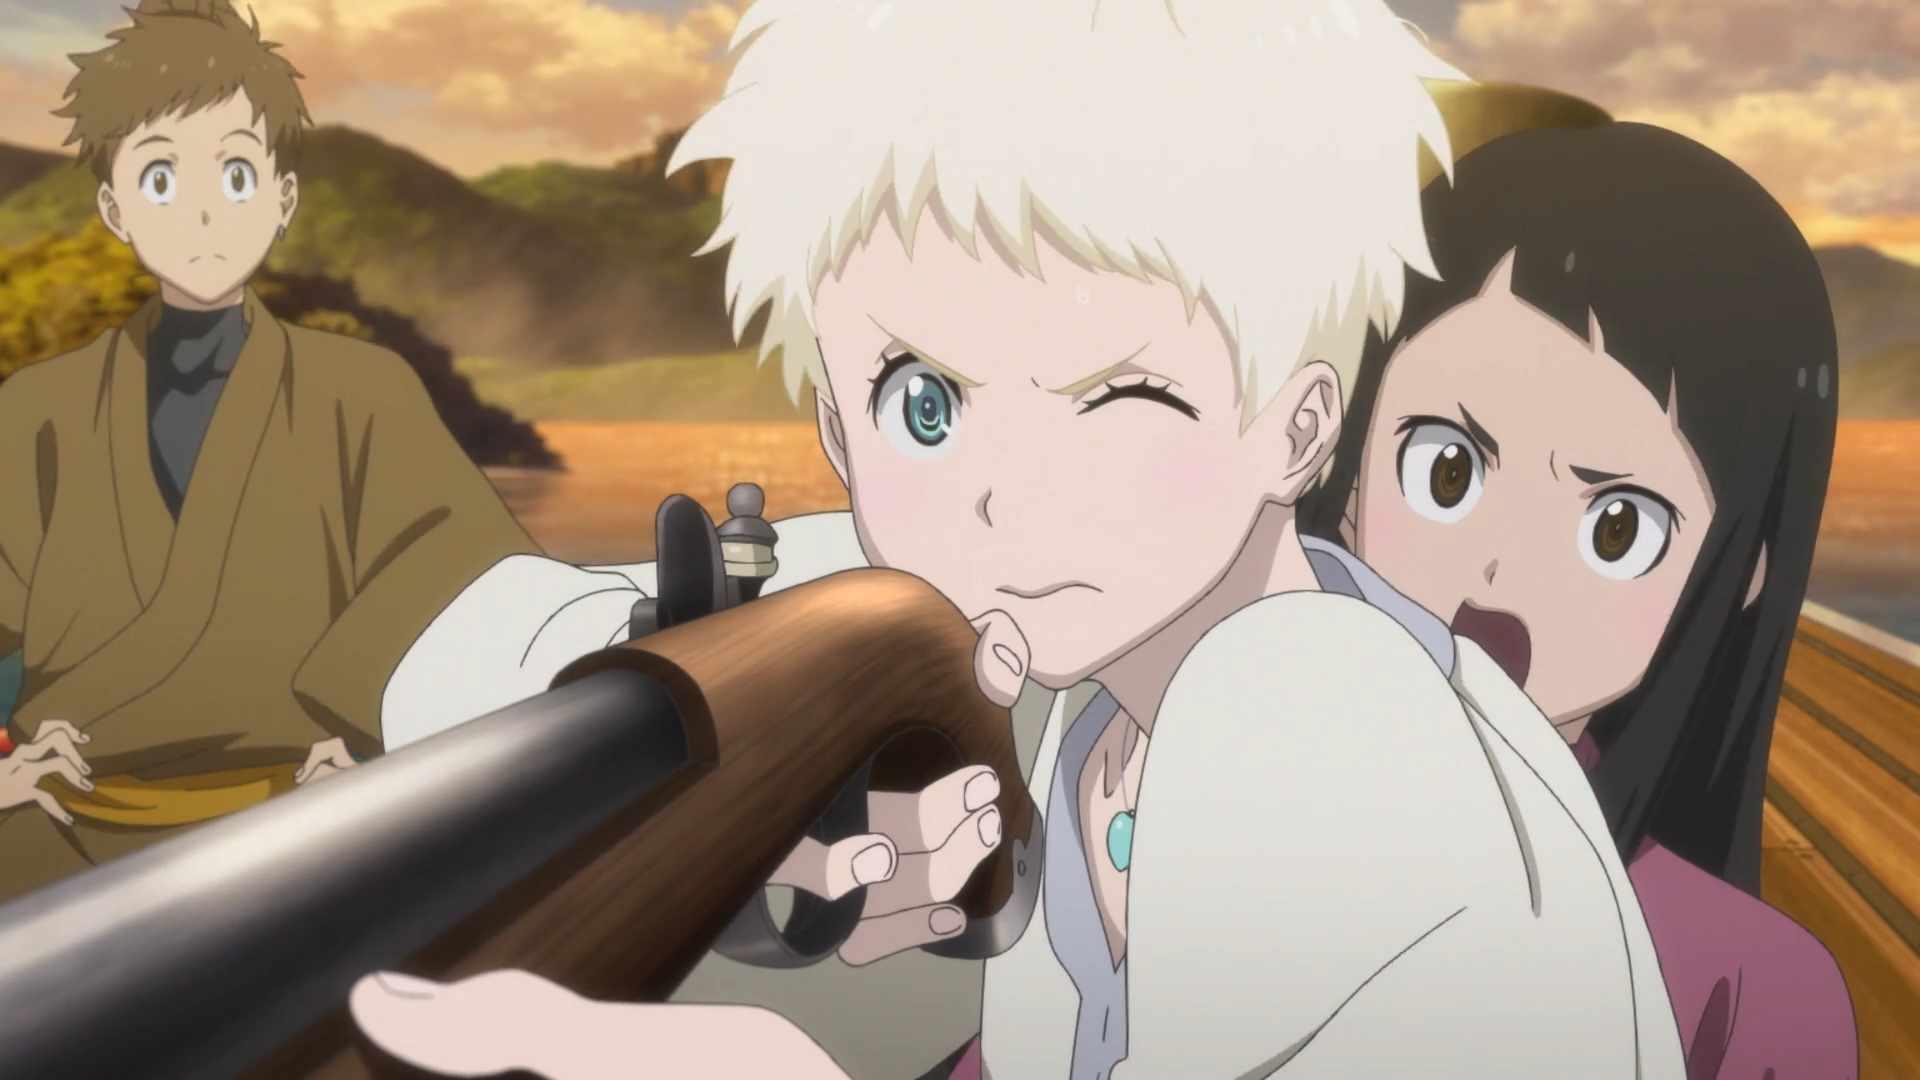 Kaizoku Oujo – Episode 04 (Dualsubs) x265/HEVC Subtitle Indonesia & English  Lendrive